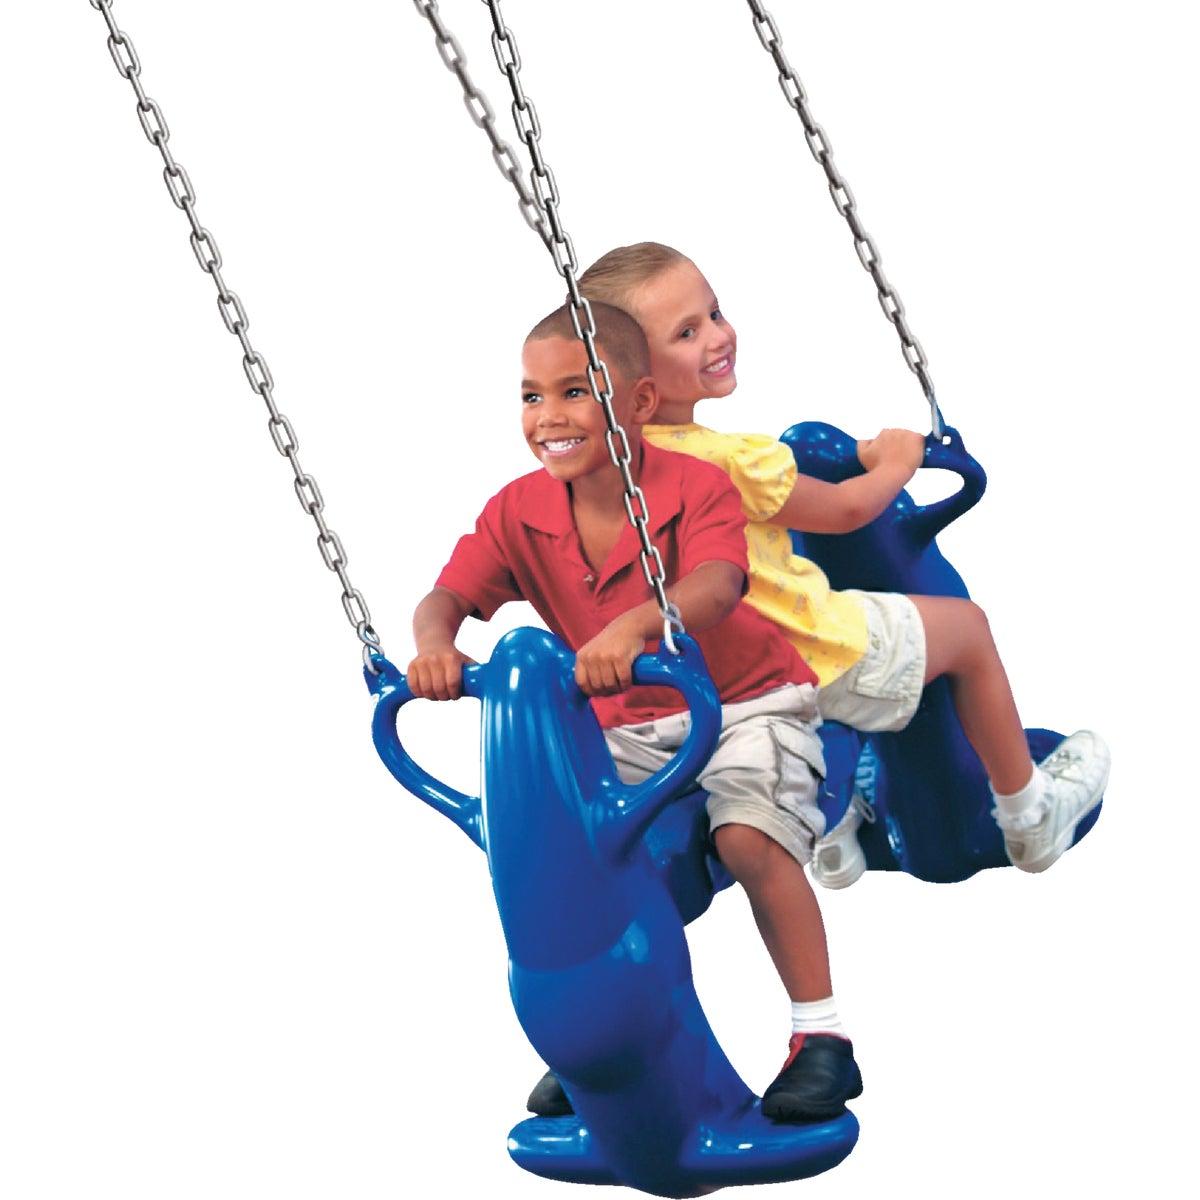 Swing N Slide 2-SEAT MEGA RIDER SWING NE4537